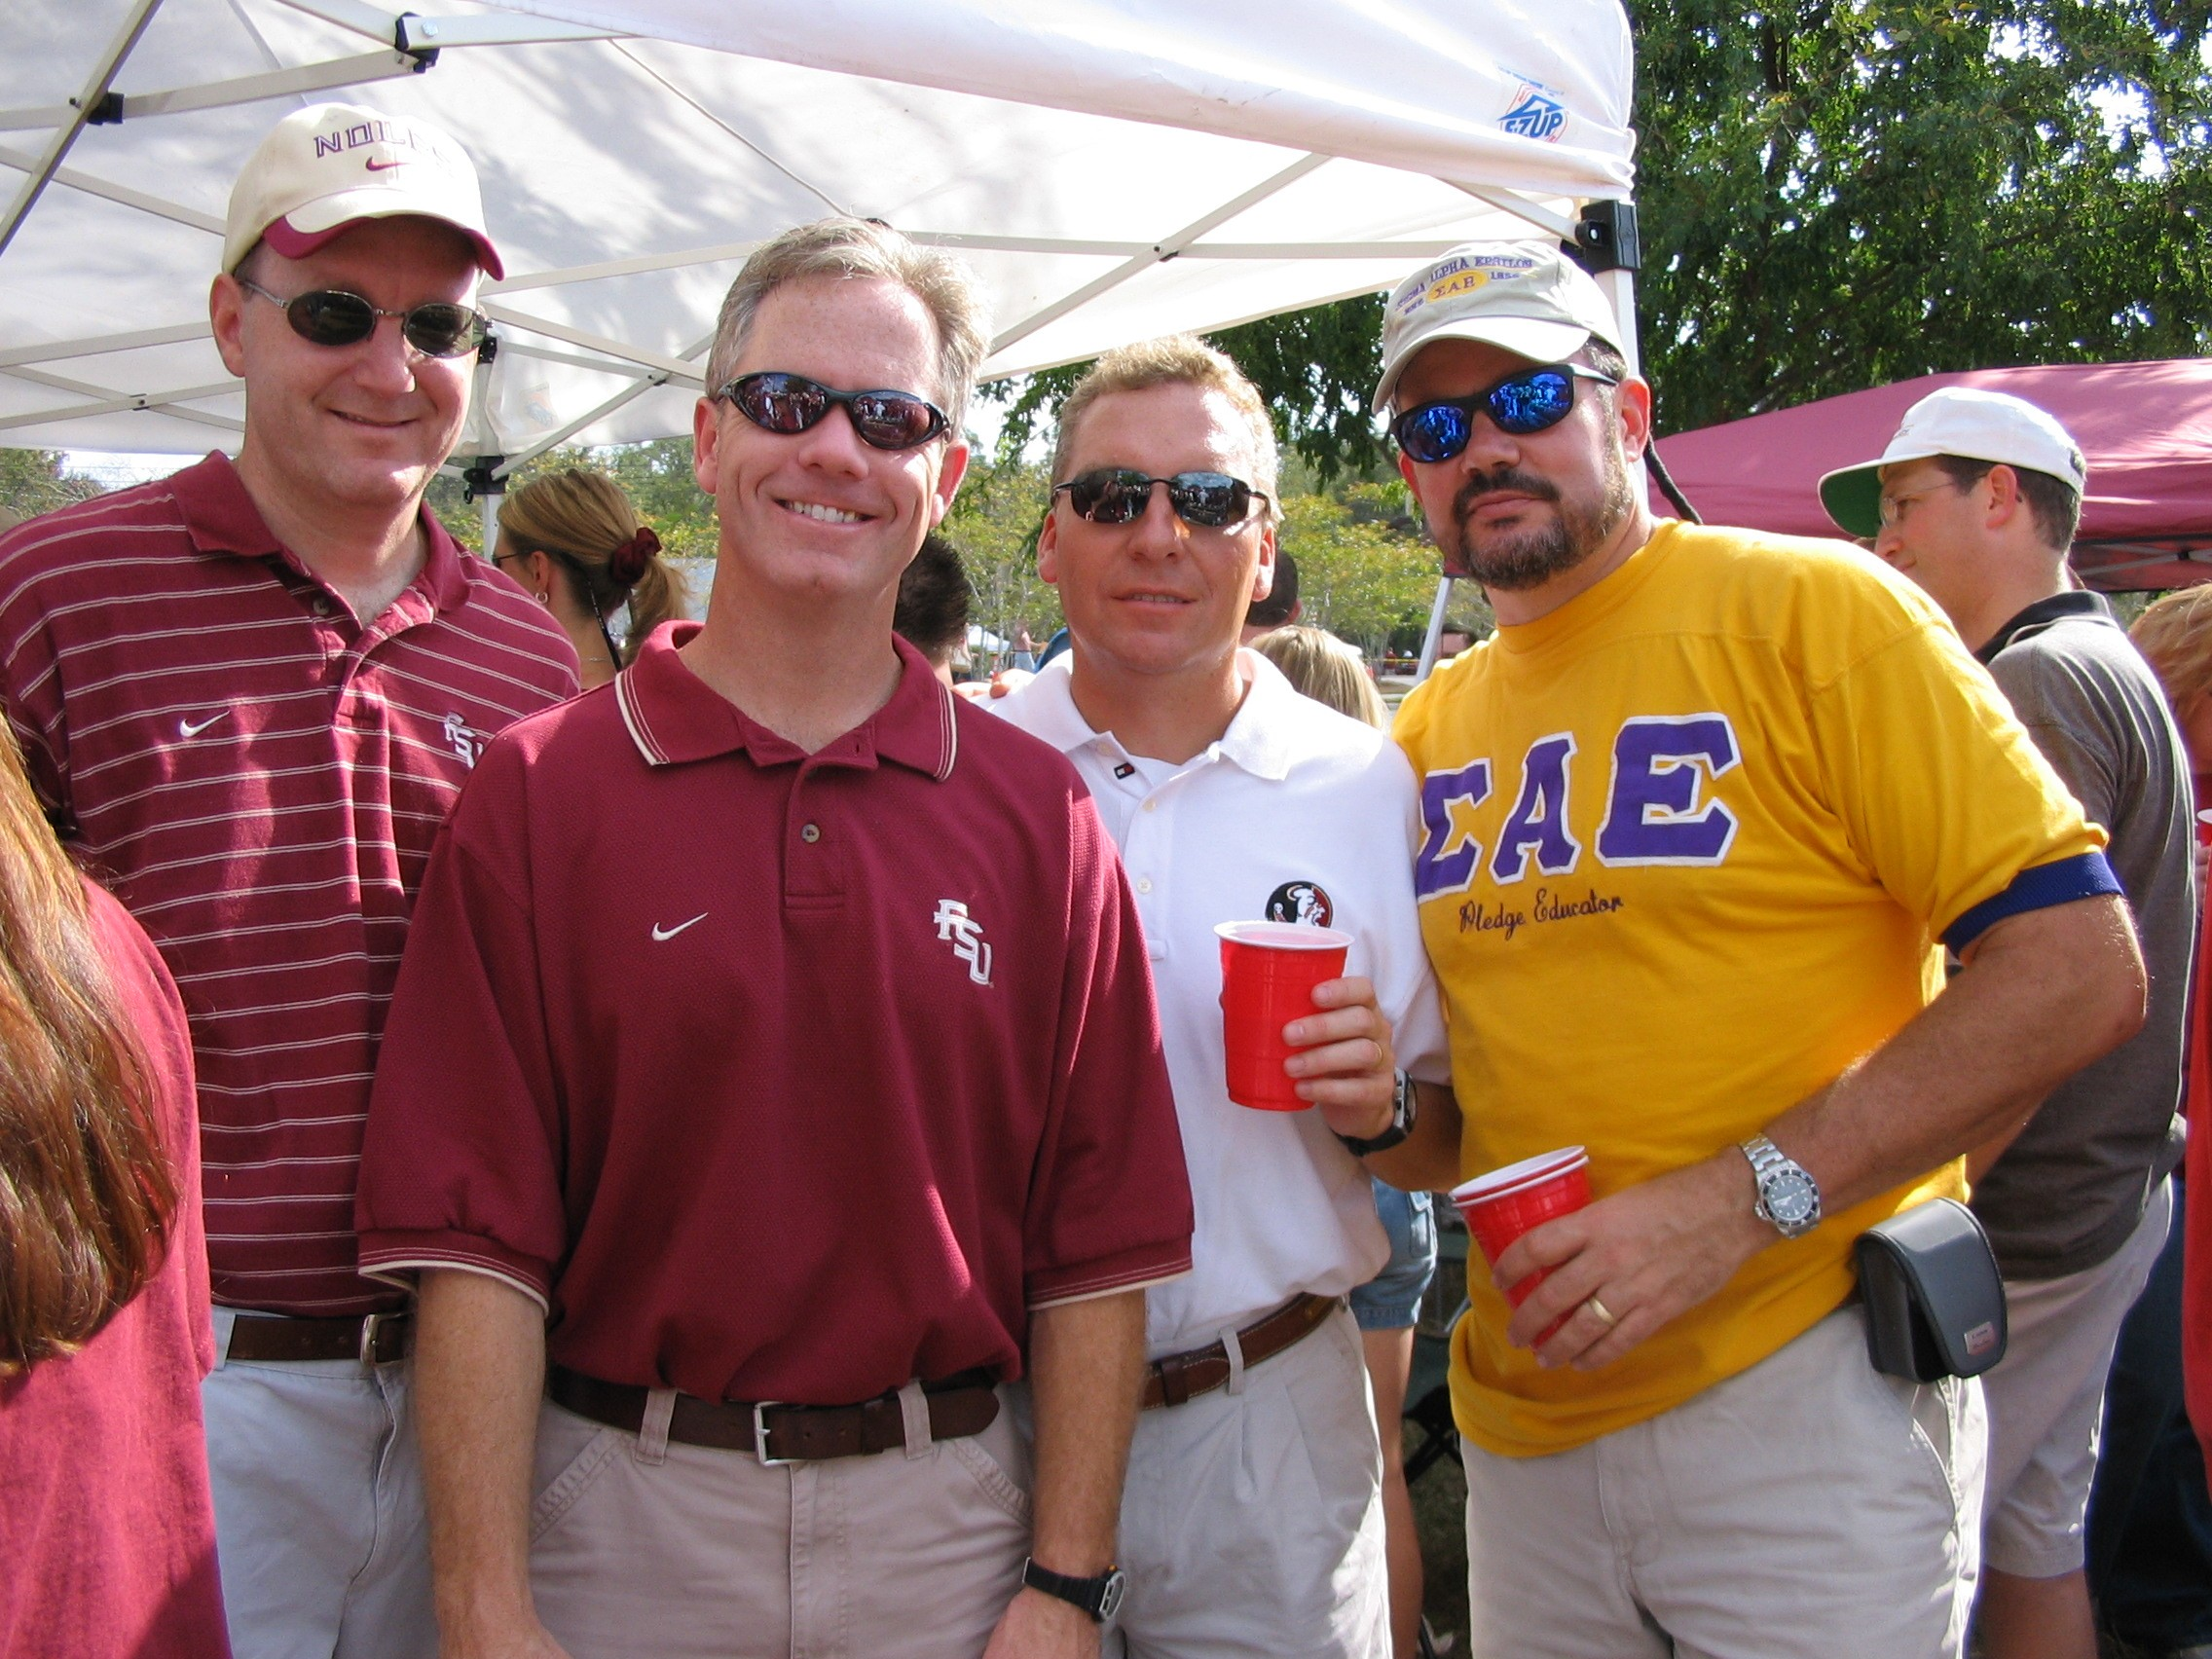 2005 alumni tailgate-TBD, SteveSills, DaveLips, Sabu.JPG